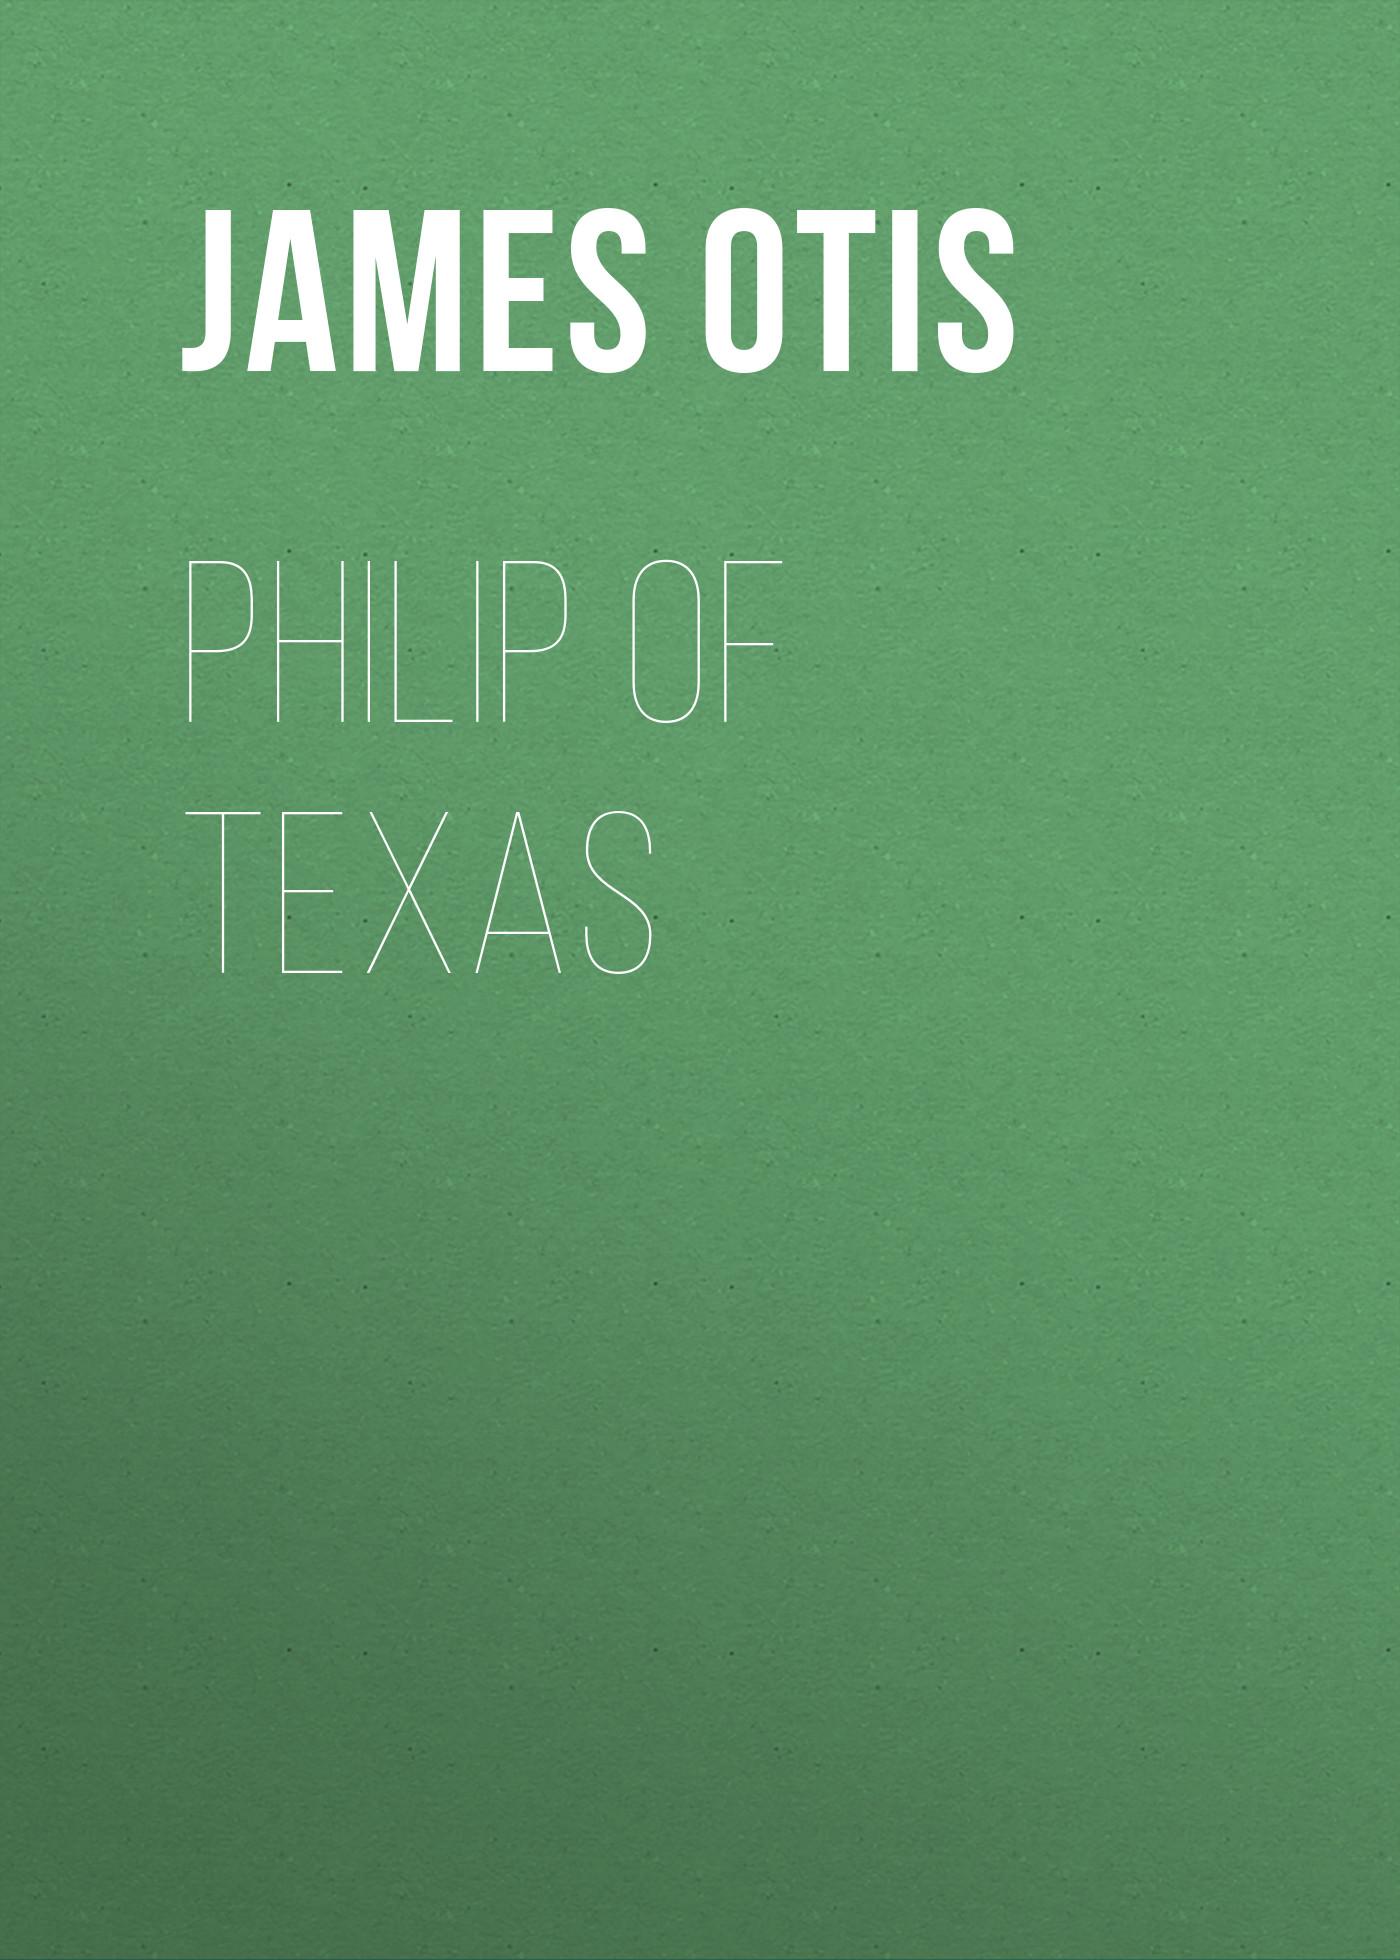 Otis James Philip of Texas skagen ремни и браслеты для часов skagen sk694xltmb page 7